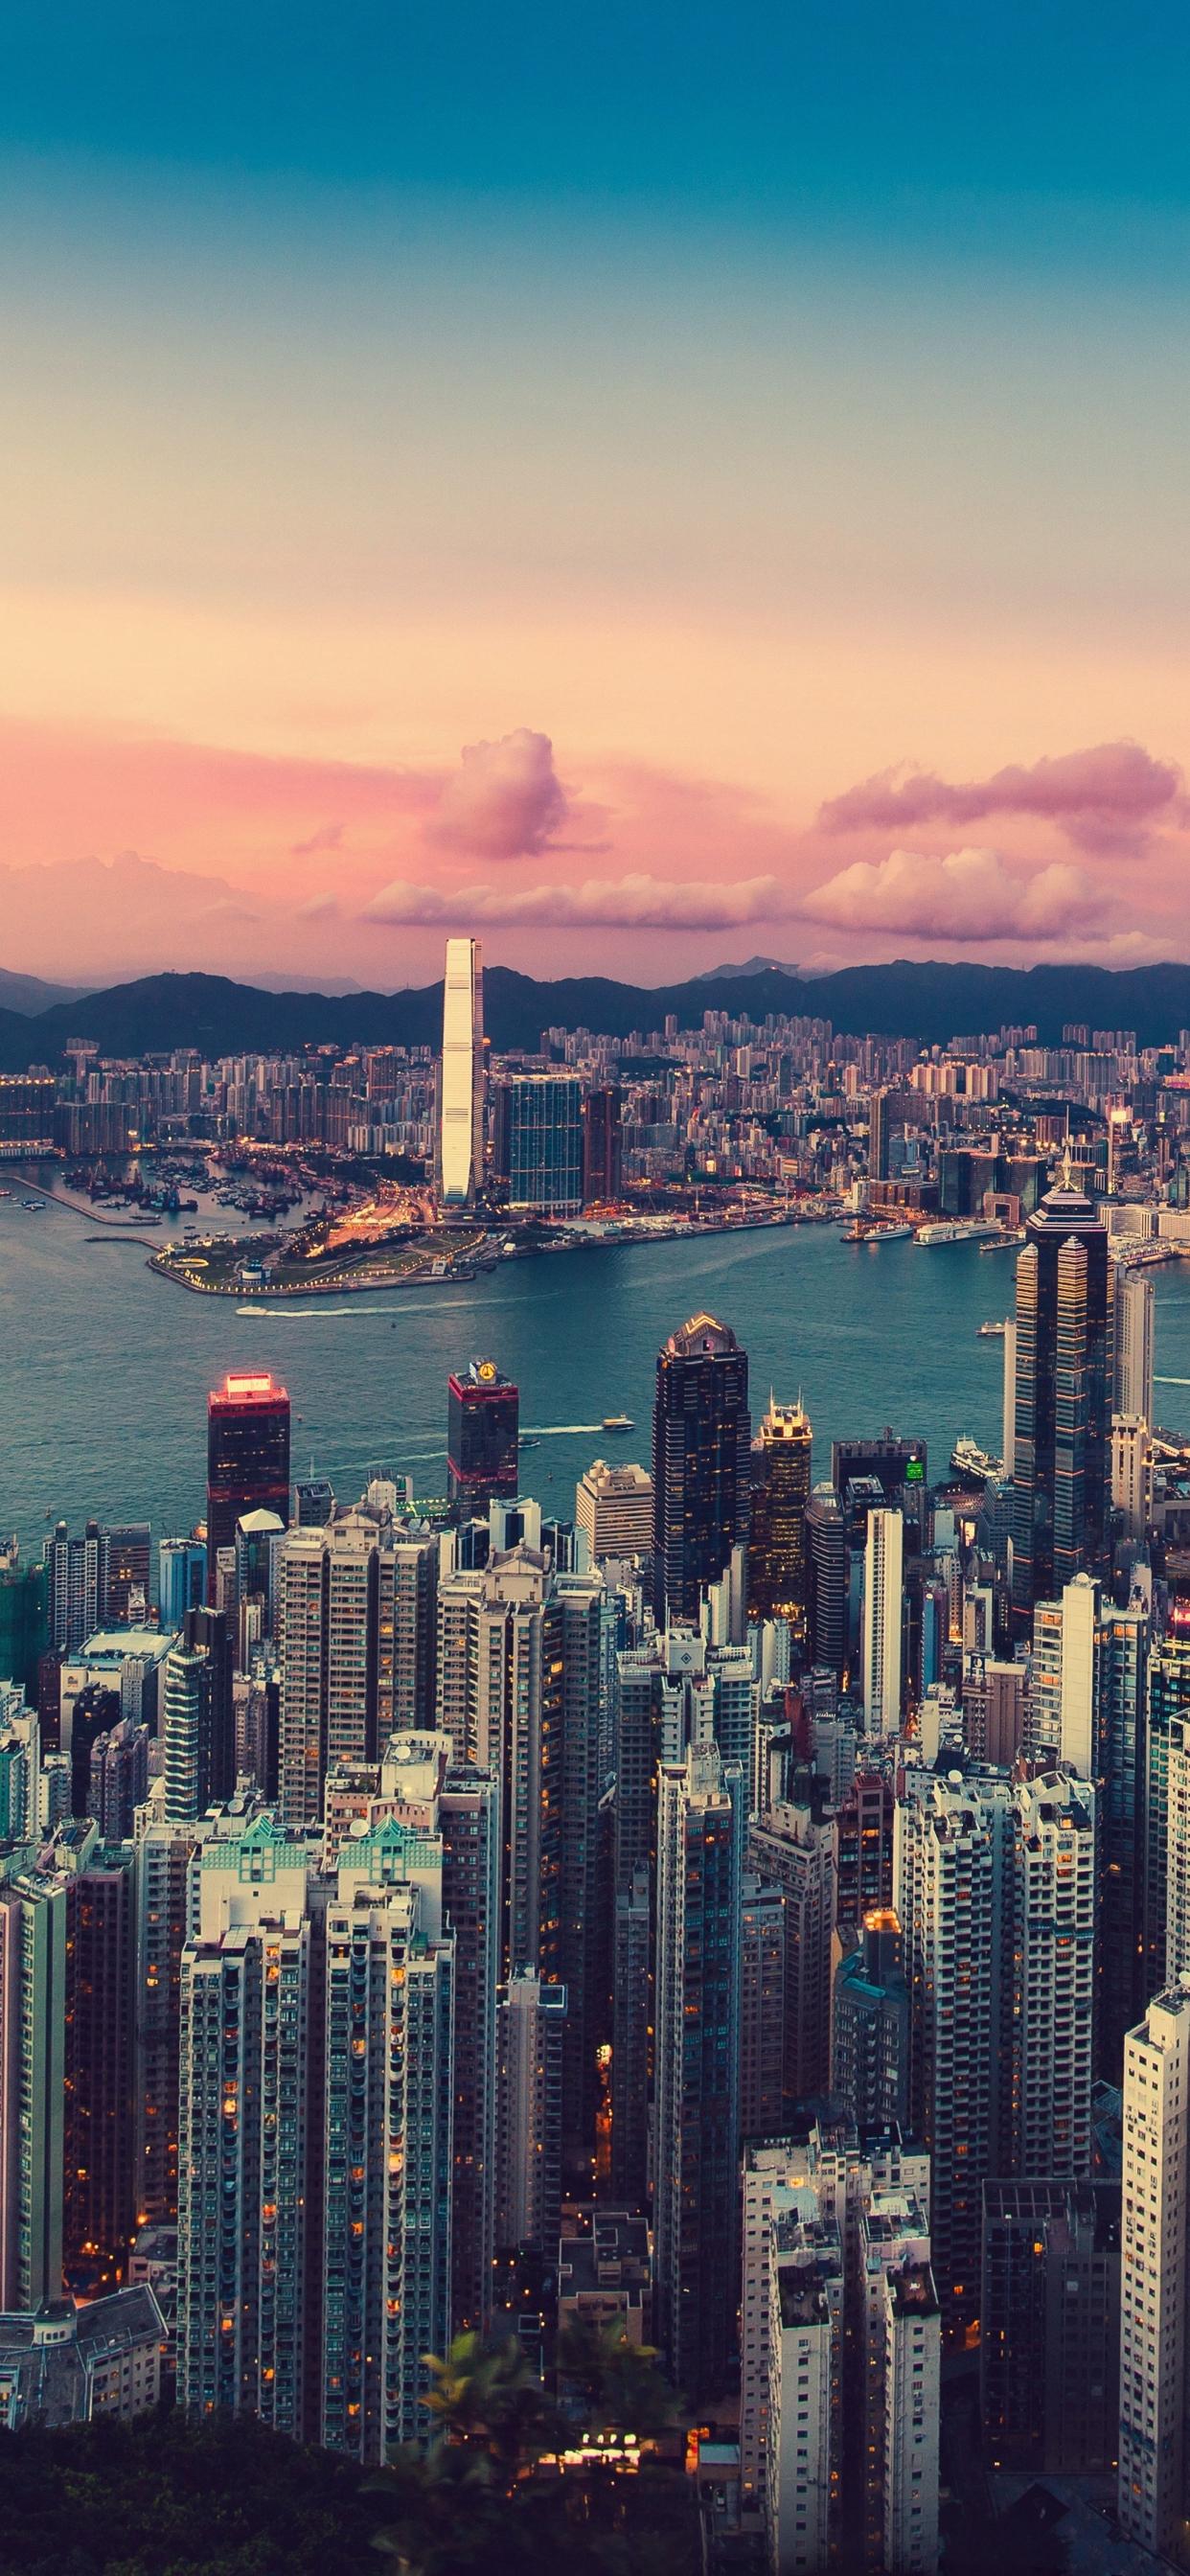 1242x2688 Hong Kong 8k Iphone Xs Max Wallpaper Hd City 4k Wallpapers Images Photos And Background